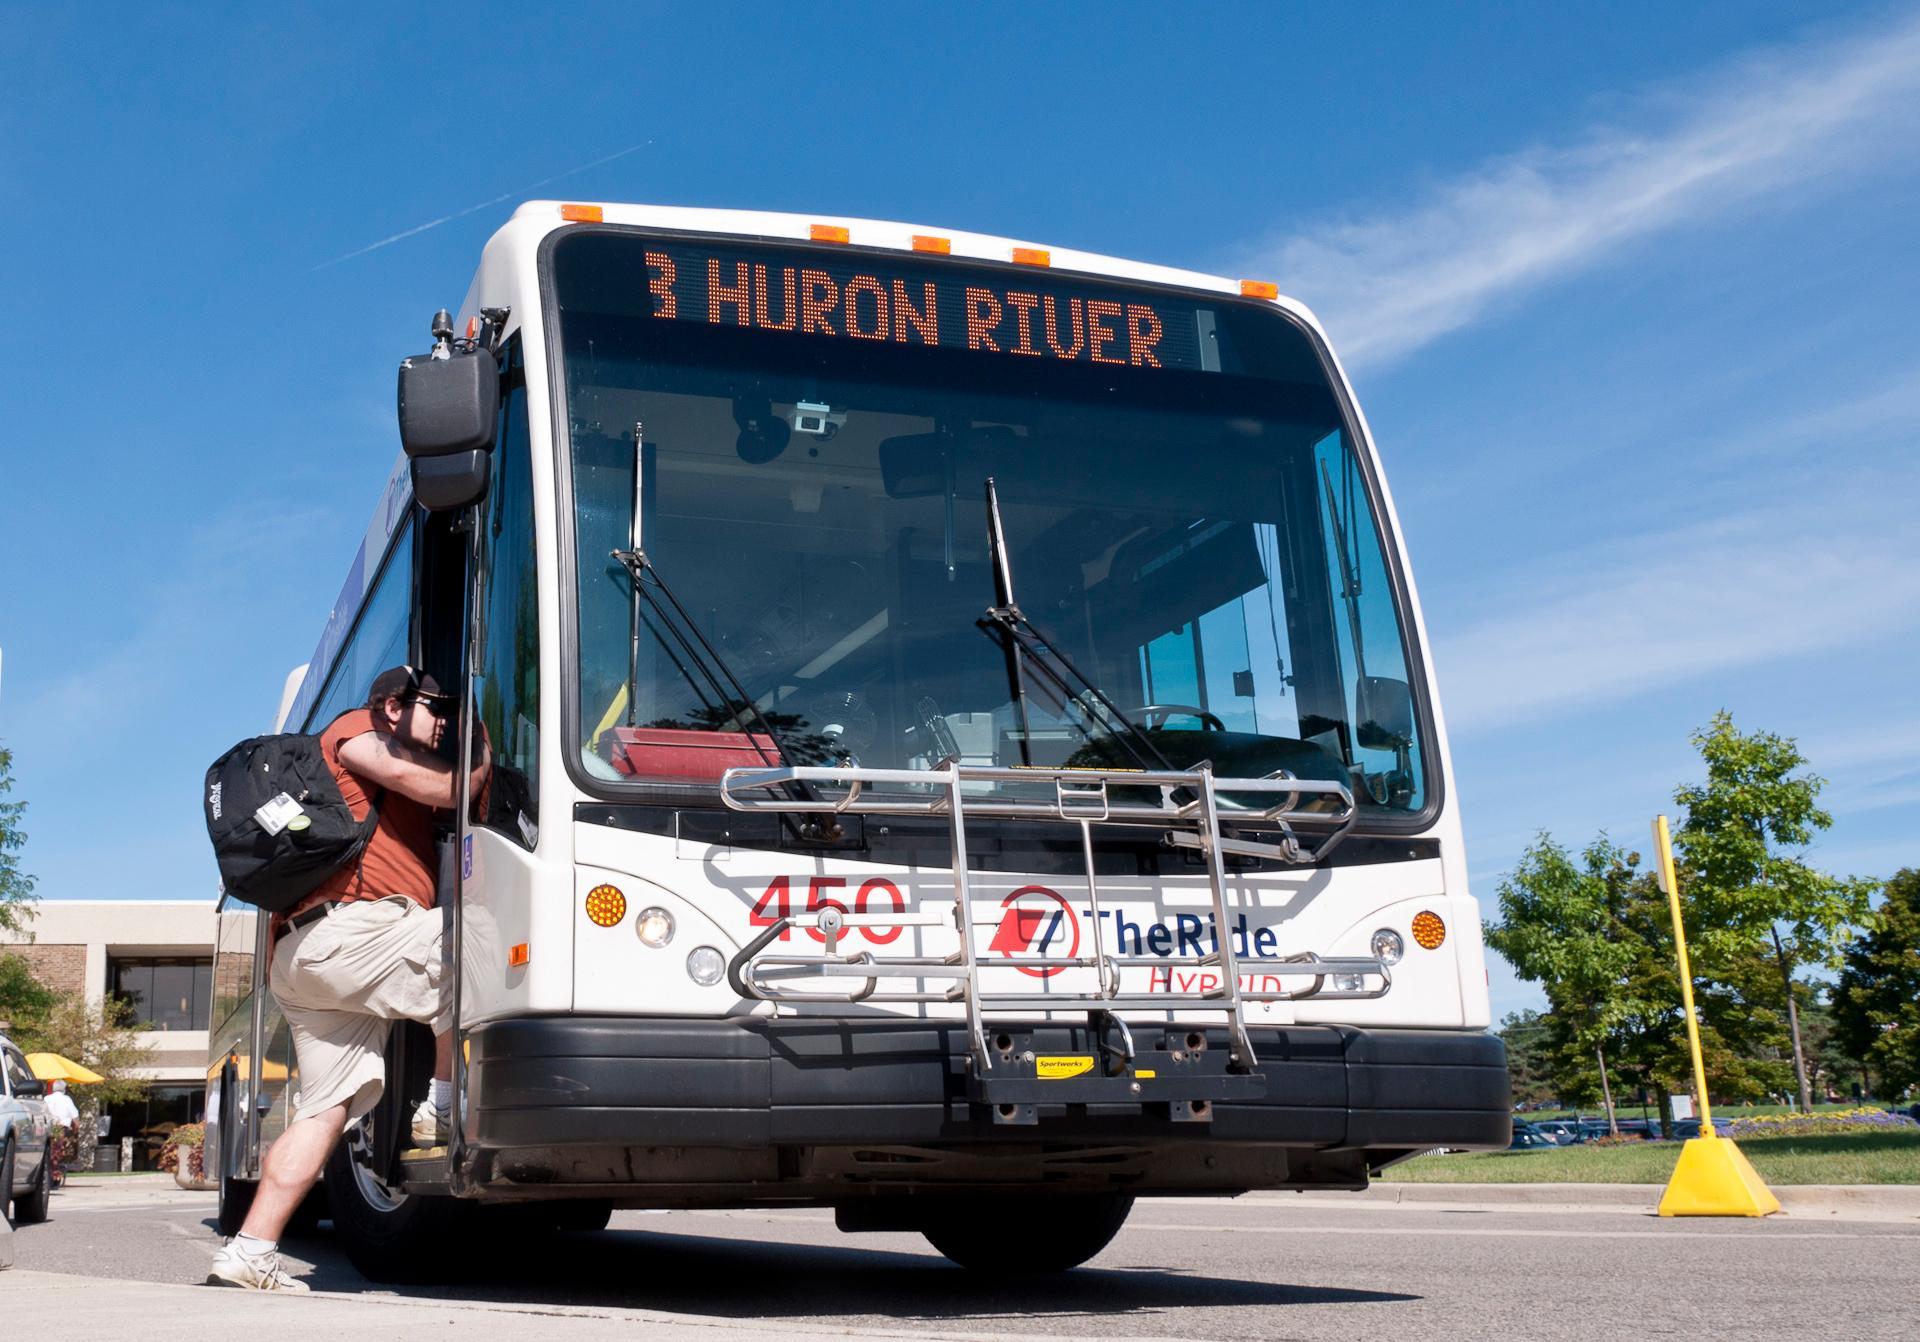 AATA hybrid bus (c) Robert Conradi 2011